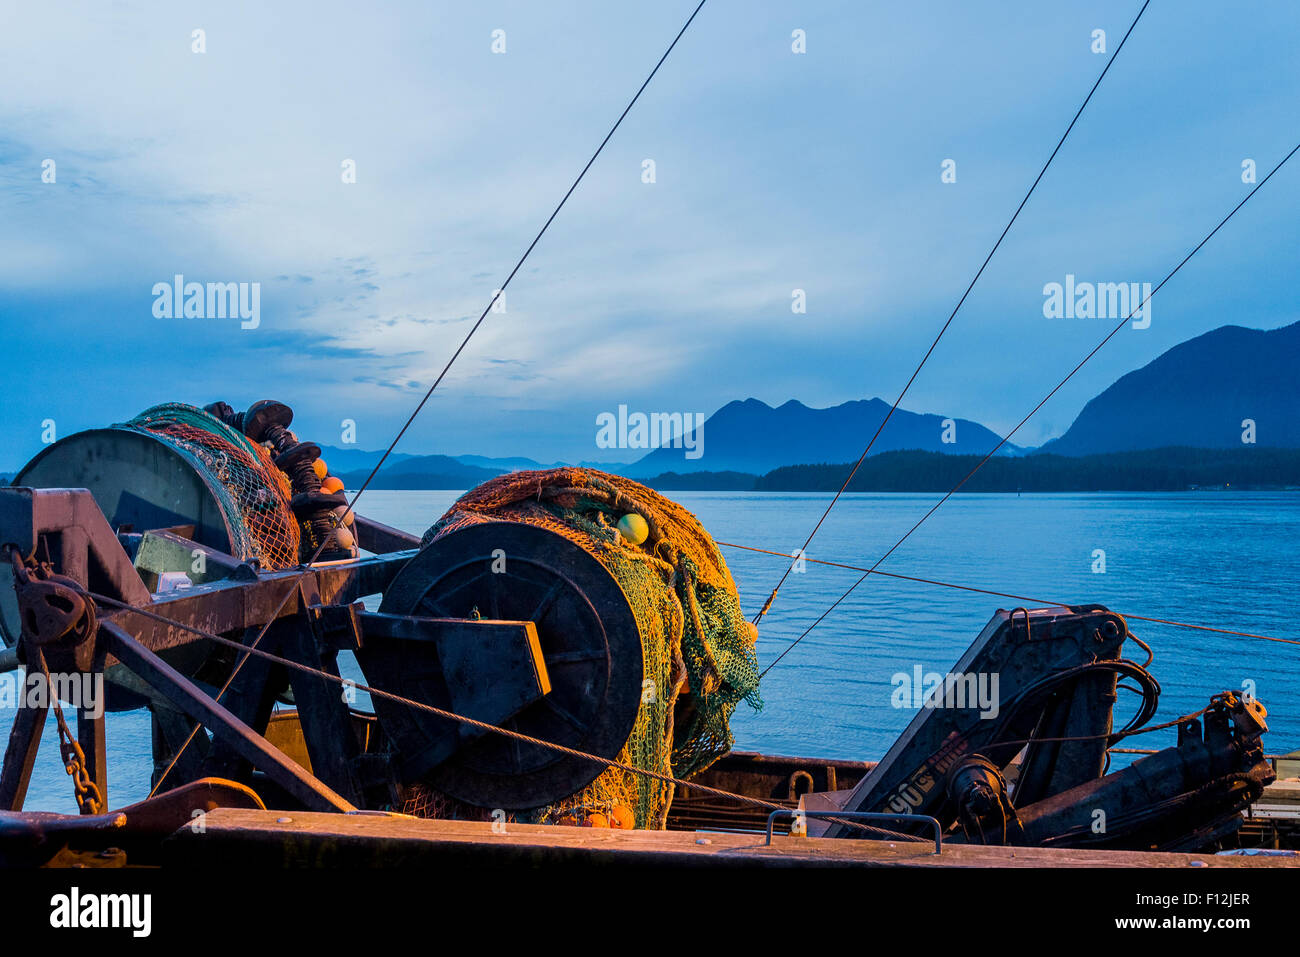 Fishing boat net winch, Tofino, British Columbia, Canada - Stock Image